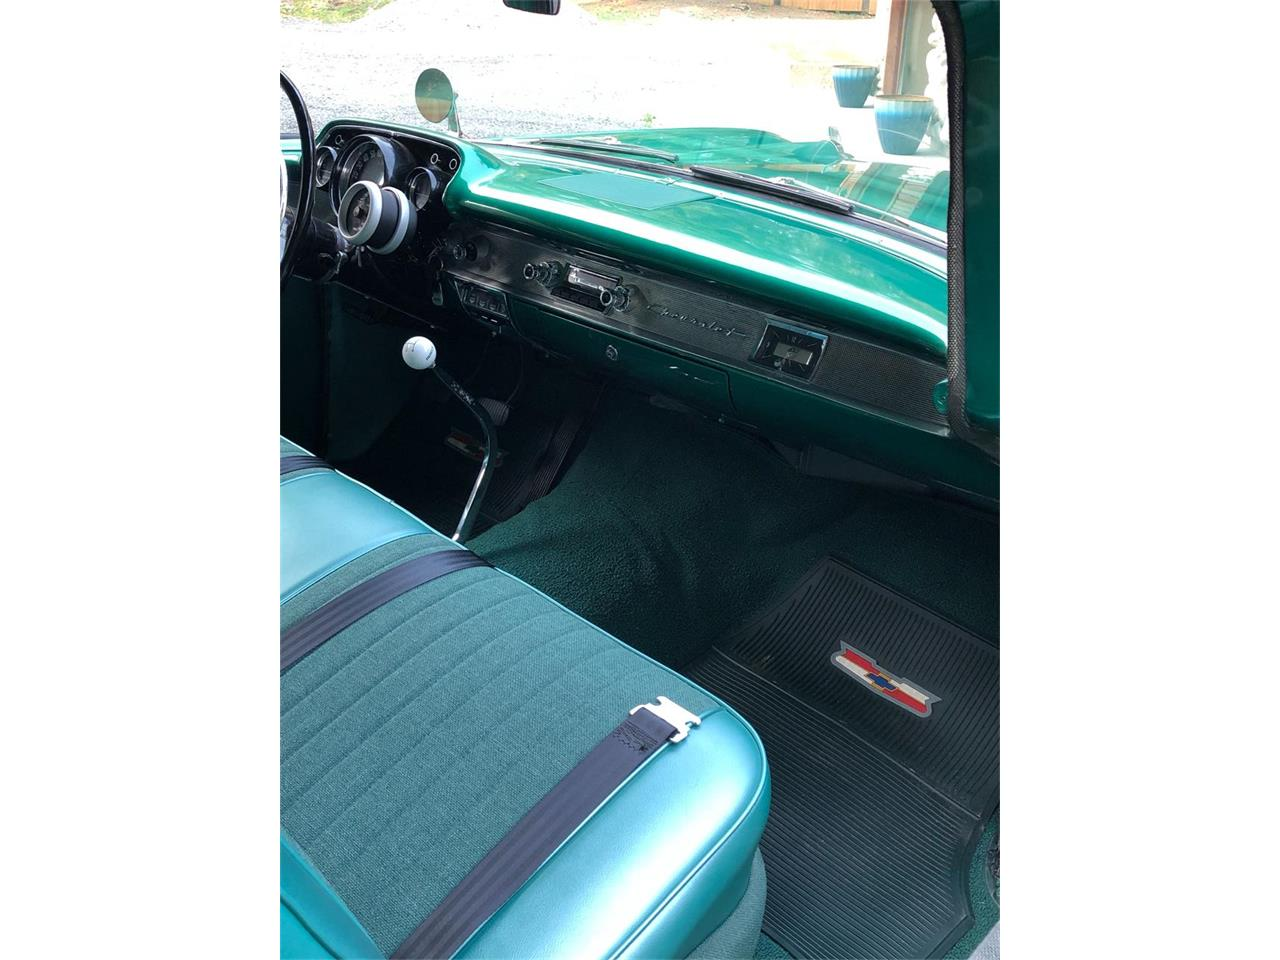 1957 Chevrolet Bel Air (CC-1389604) for sale in Arlington, Washington